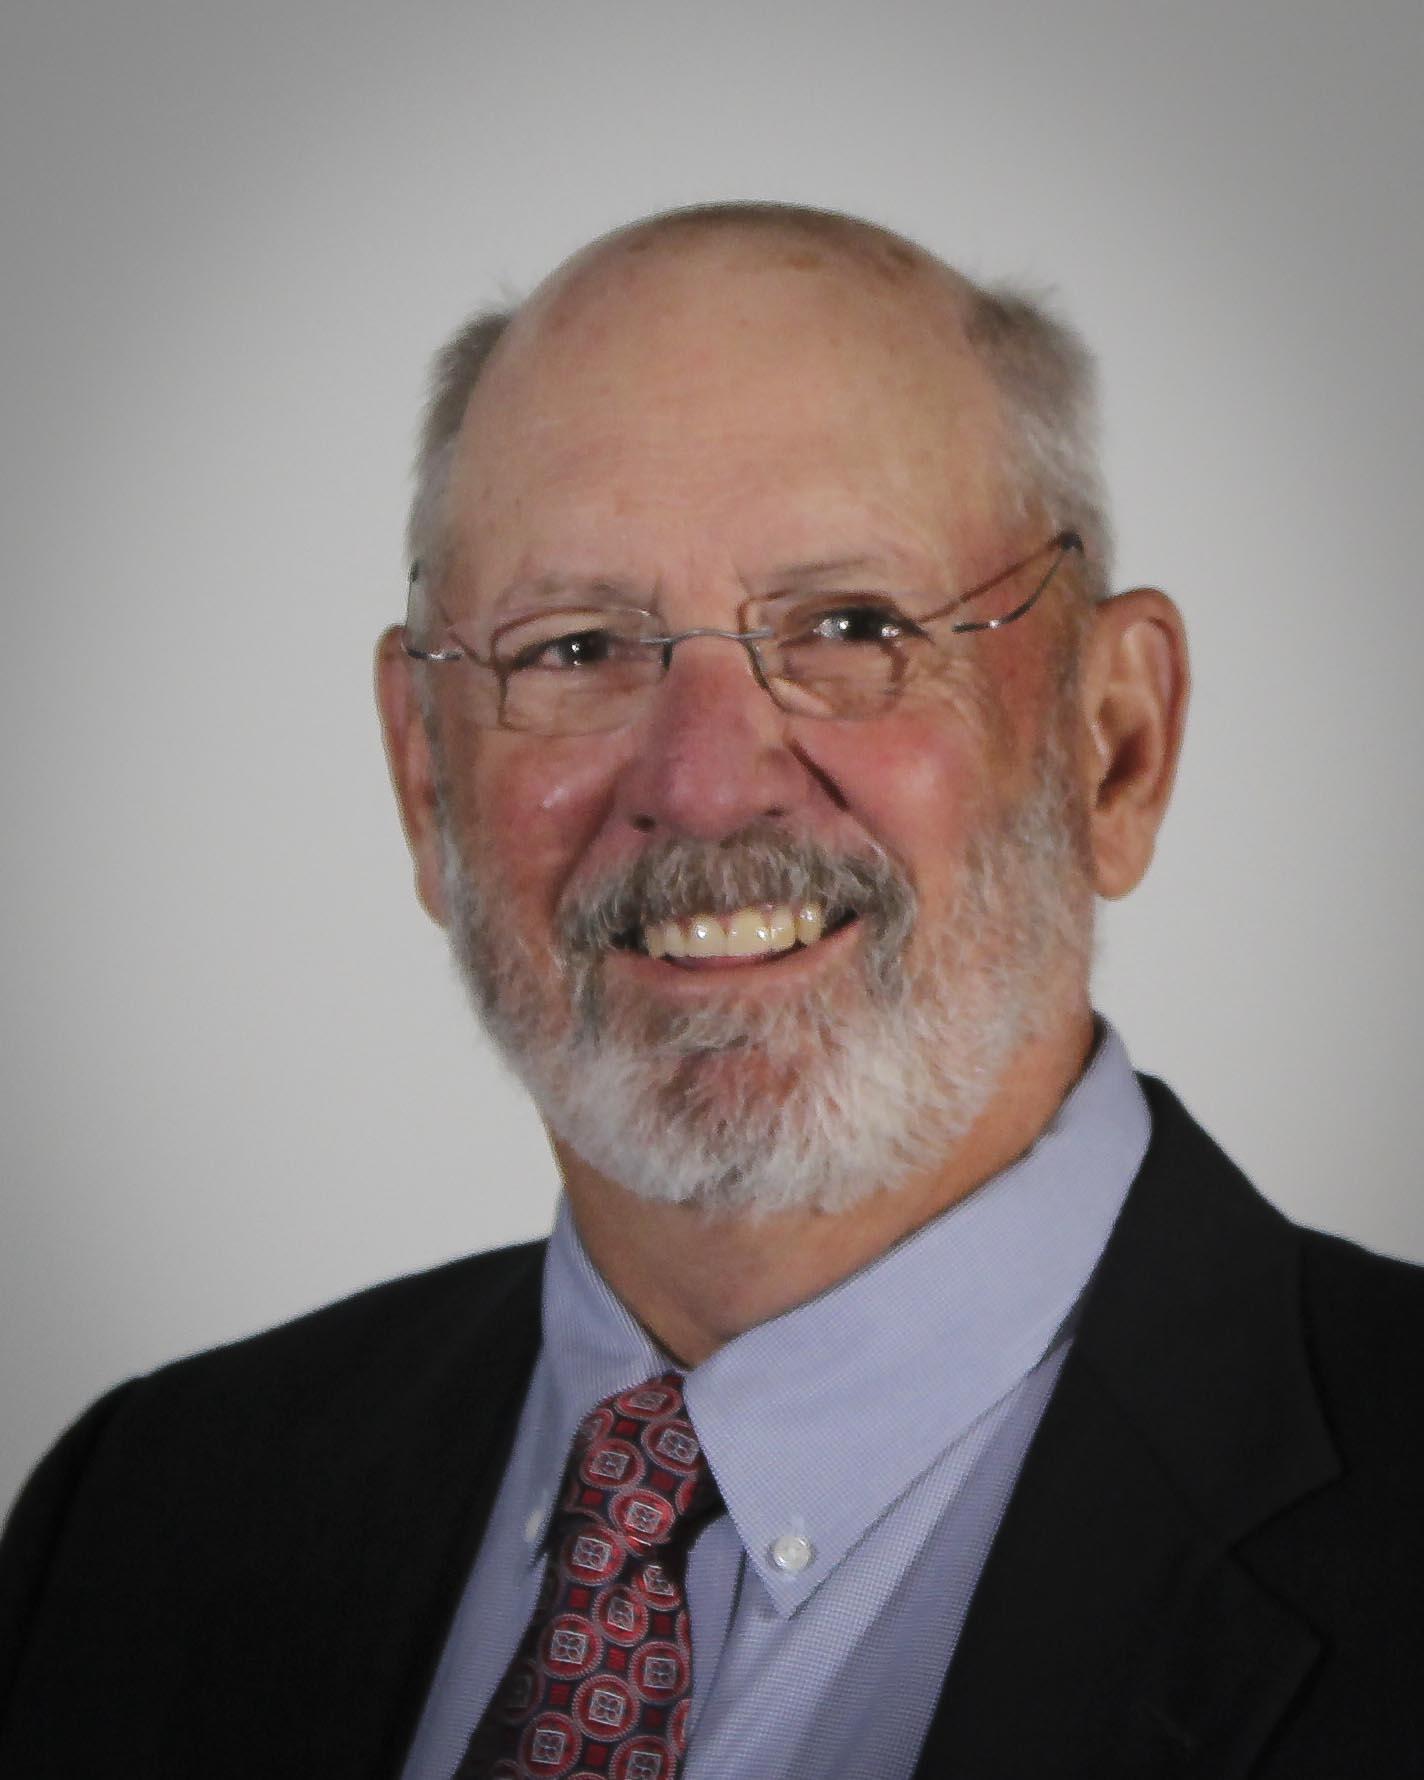 Craig Bentsen